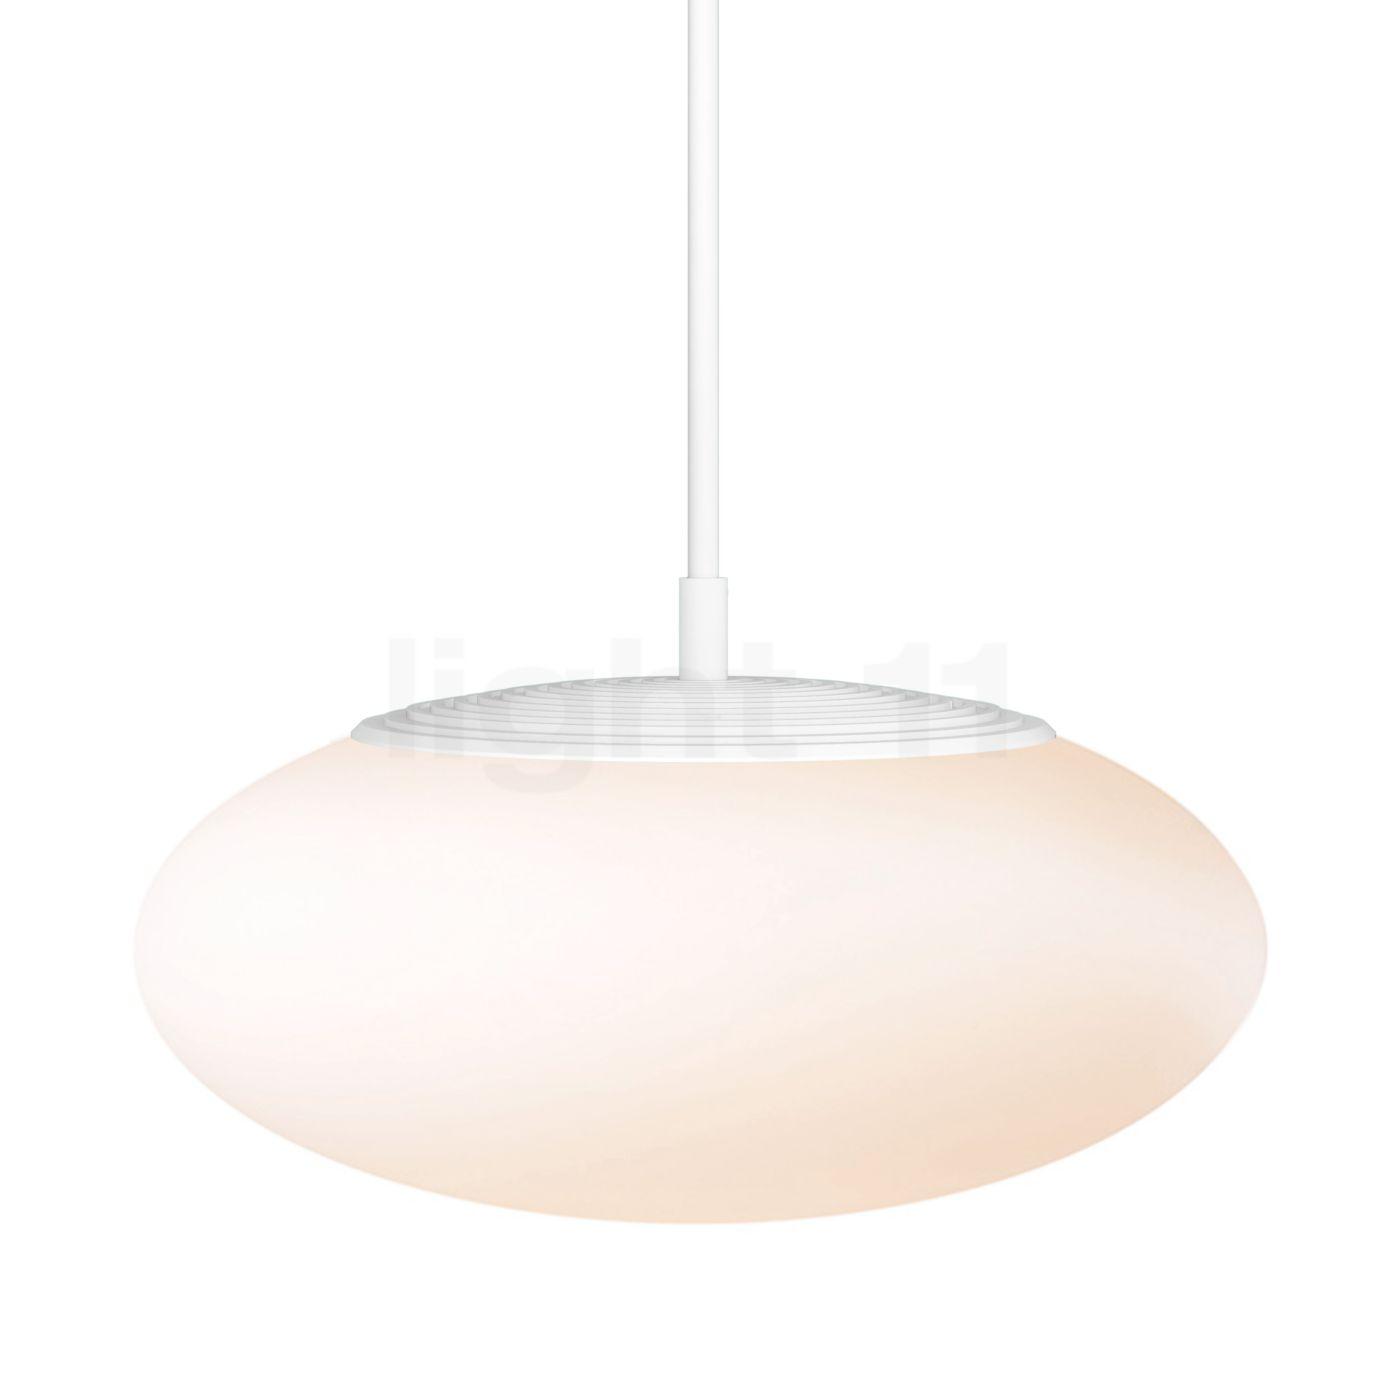 Mawa Humboldt Pendelleuchte LED, opal, 43 W hu 2-4